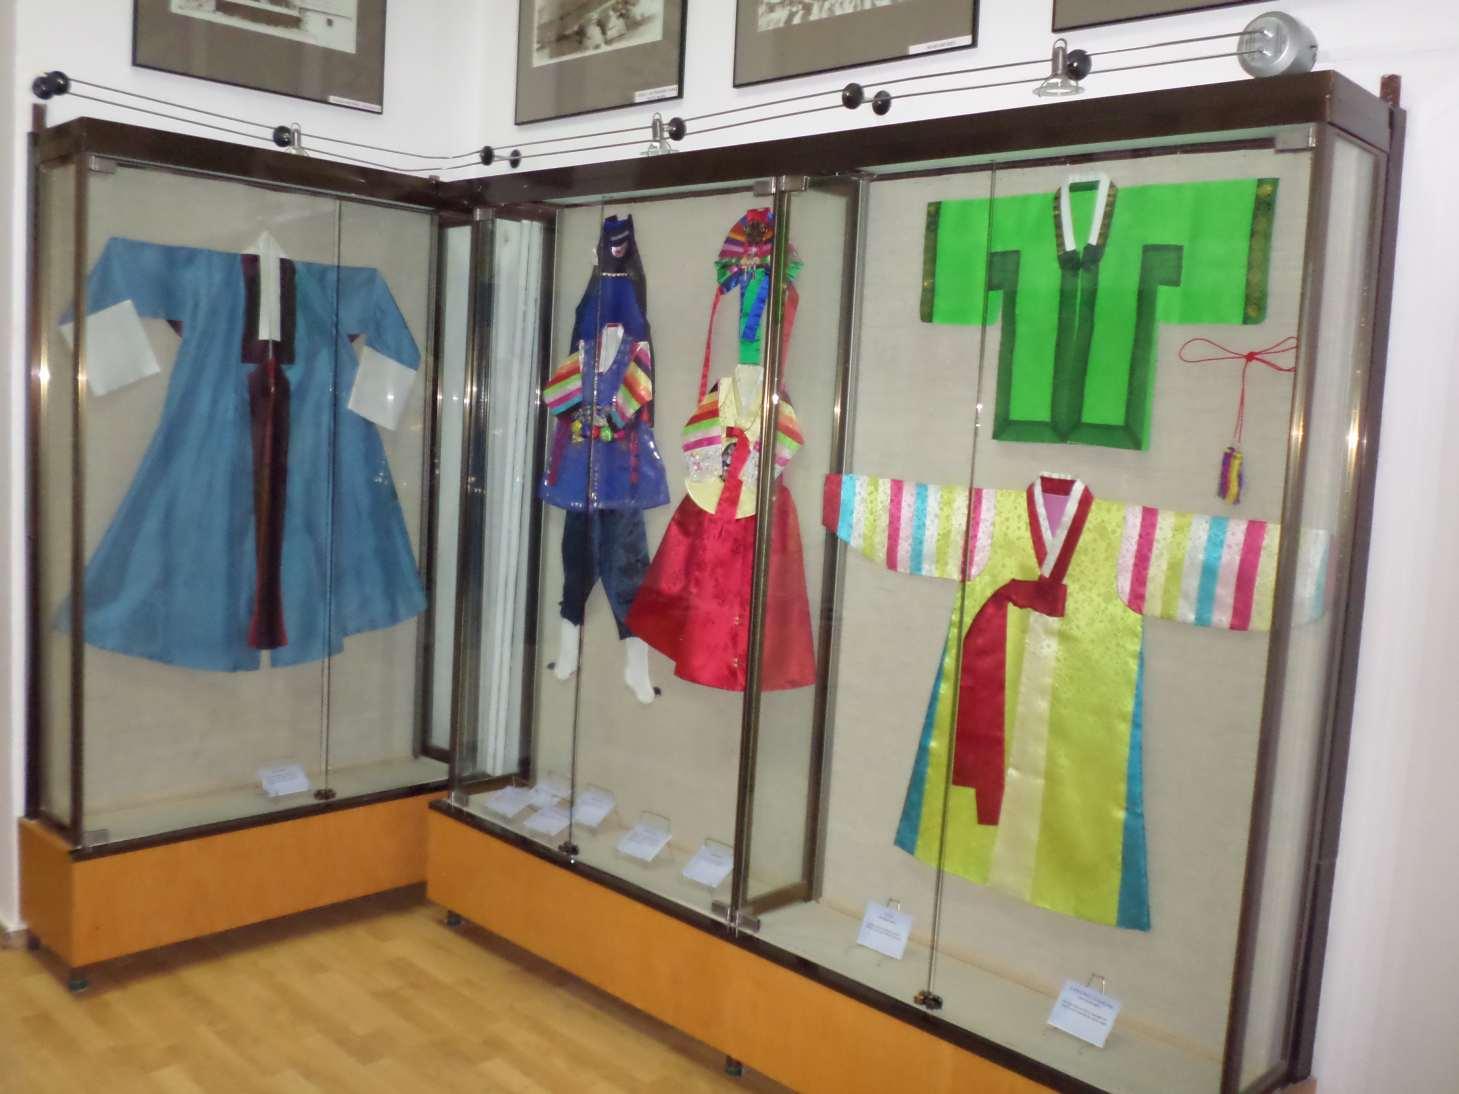 expozitia temporara costumul traditional coreean muzeul de arta populara constanta foto